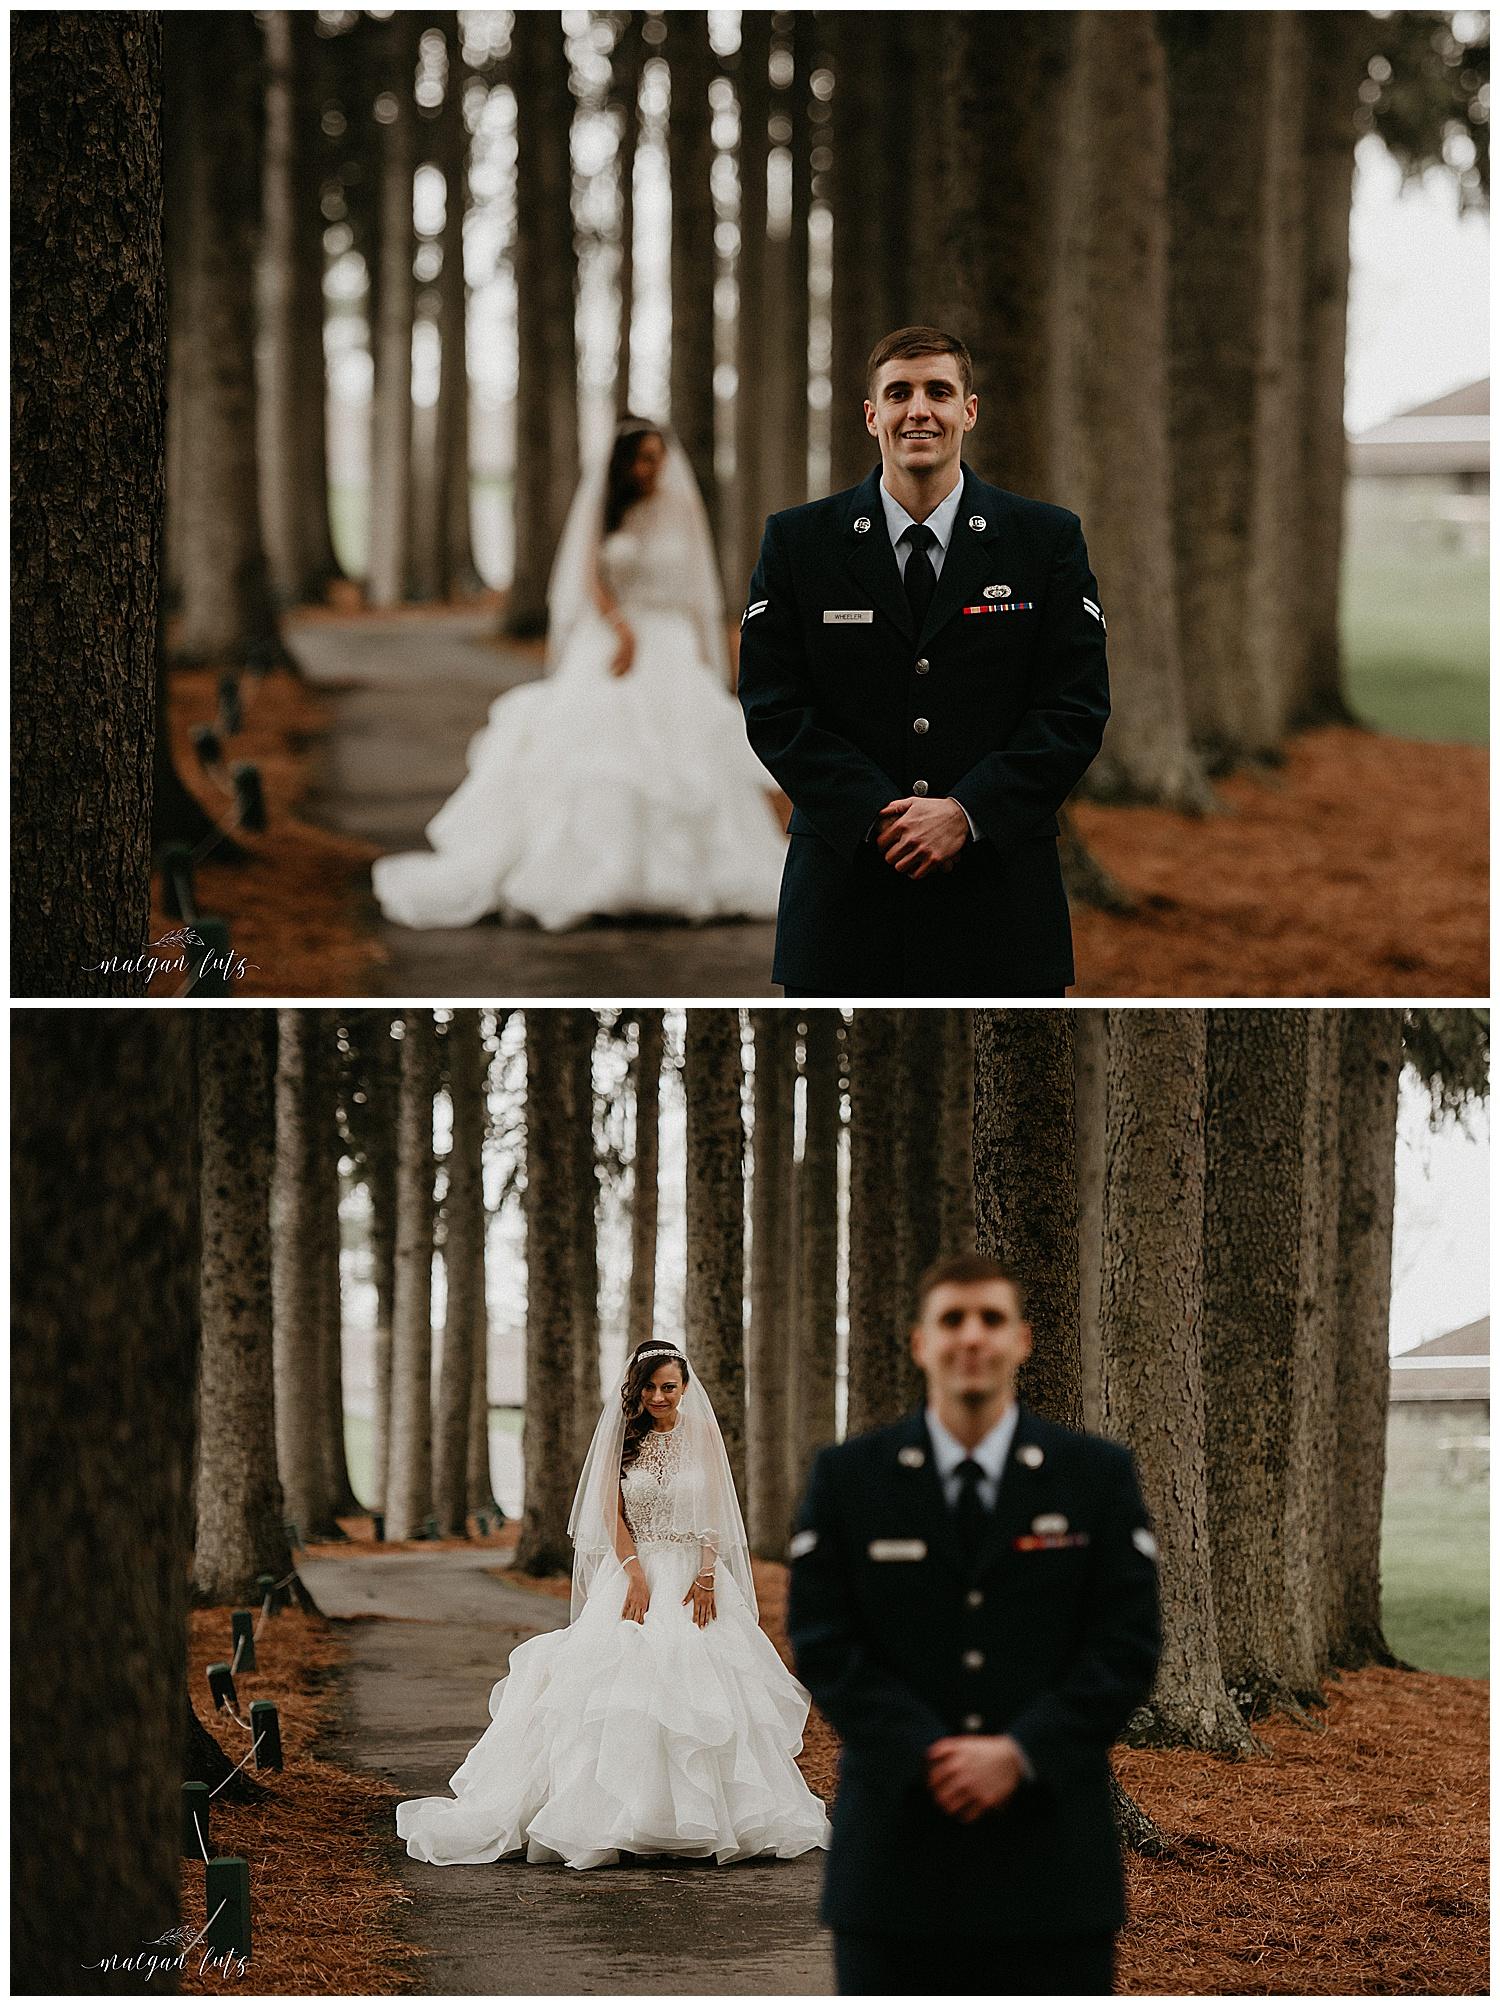 NEPA-Lehigh-Valley-Wedding-Photographer-at-Glen-Oak-Country-Club-Clarks-Summit-PA_0021.jpg